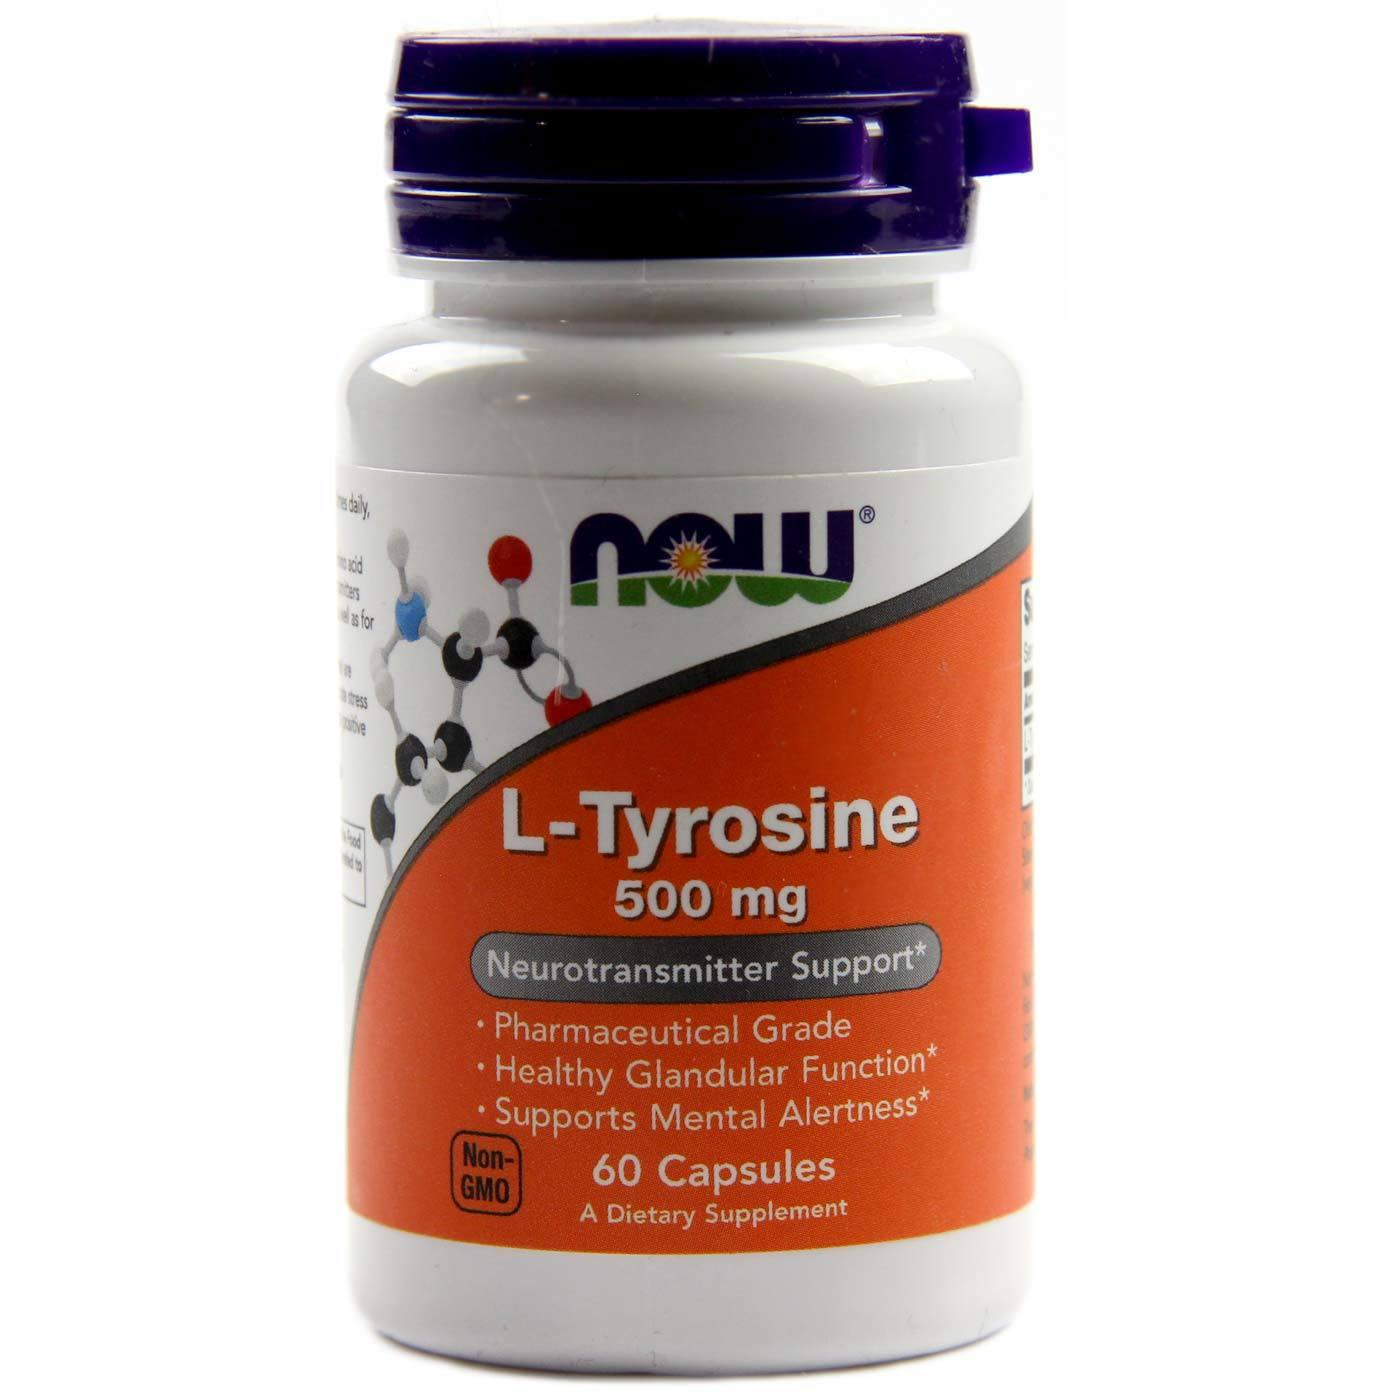 What is l tyrosine supplement